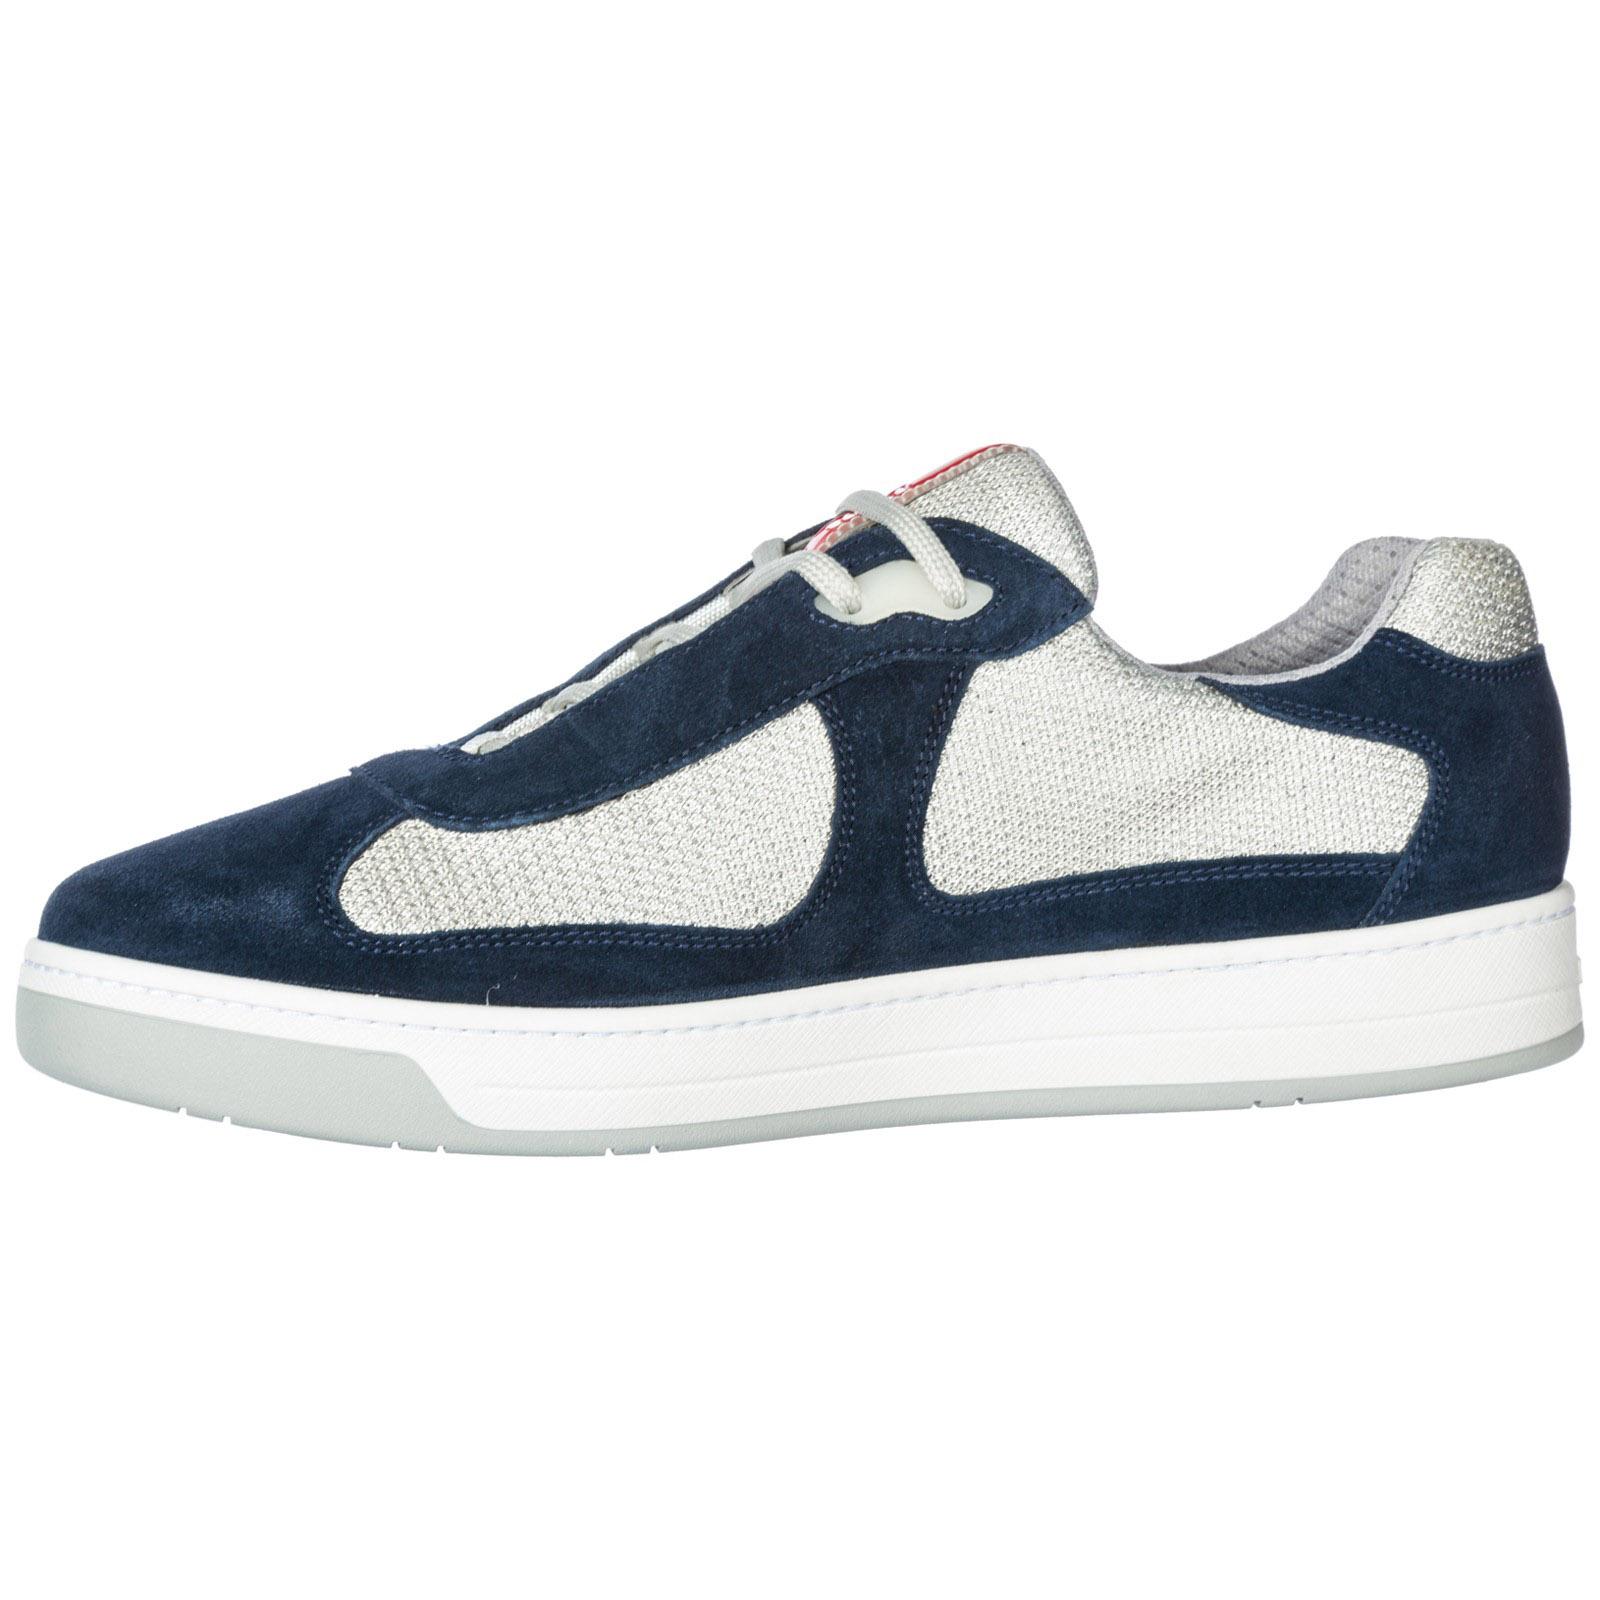 4e3166 America's f0gwa Sneakers Prada o0p Blu Cup qgXfwt